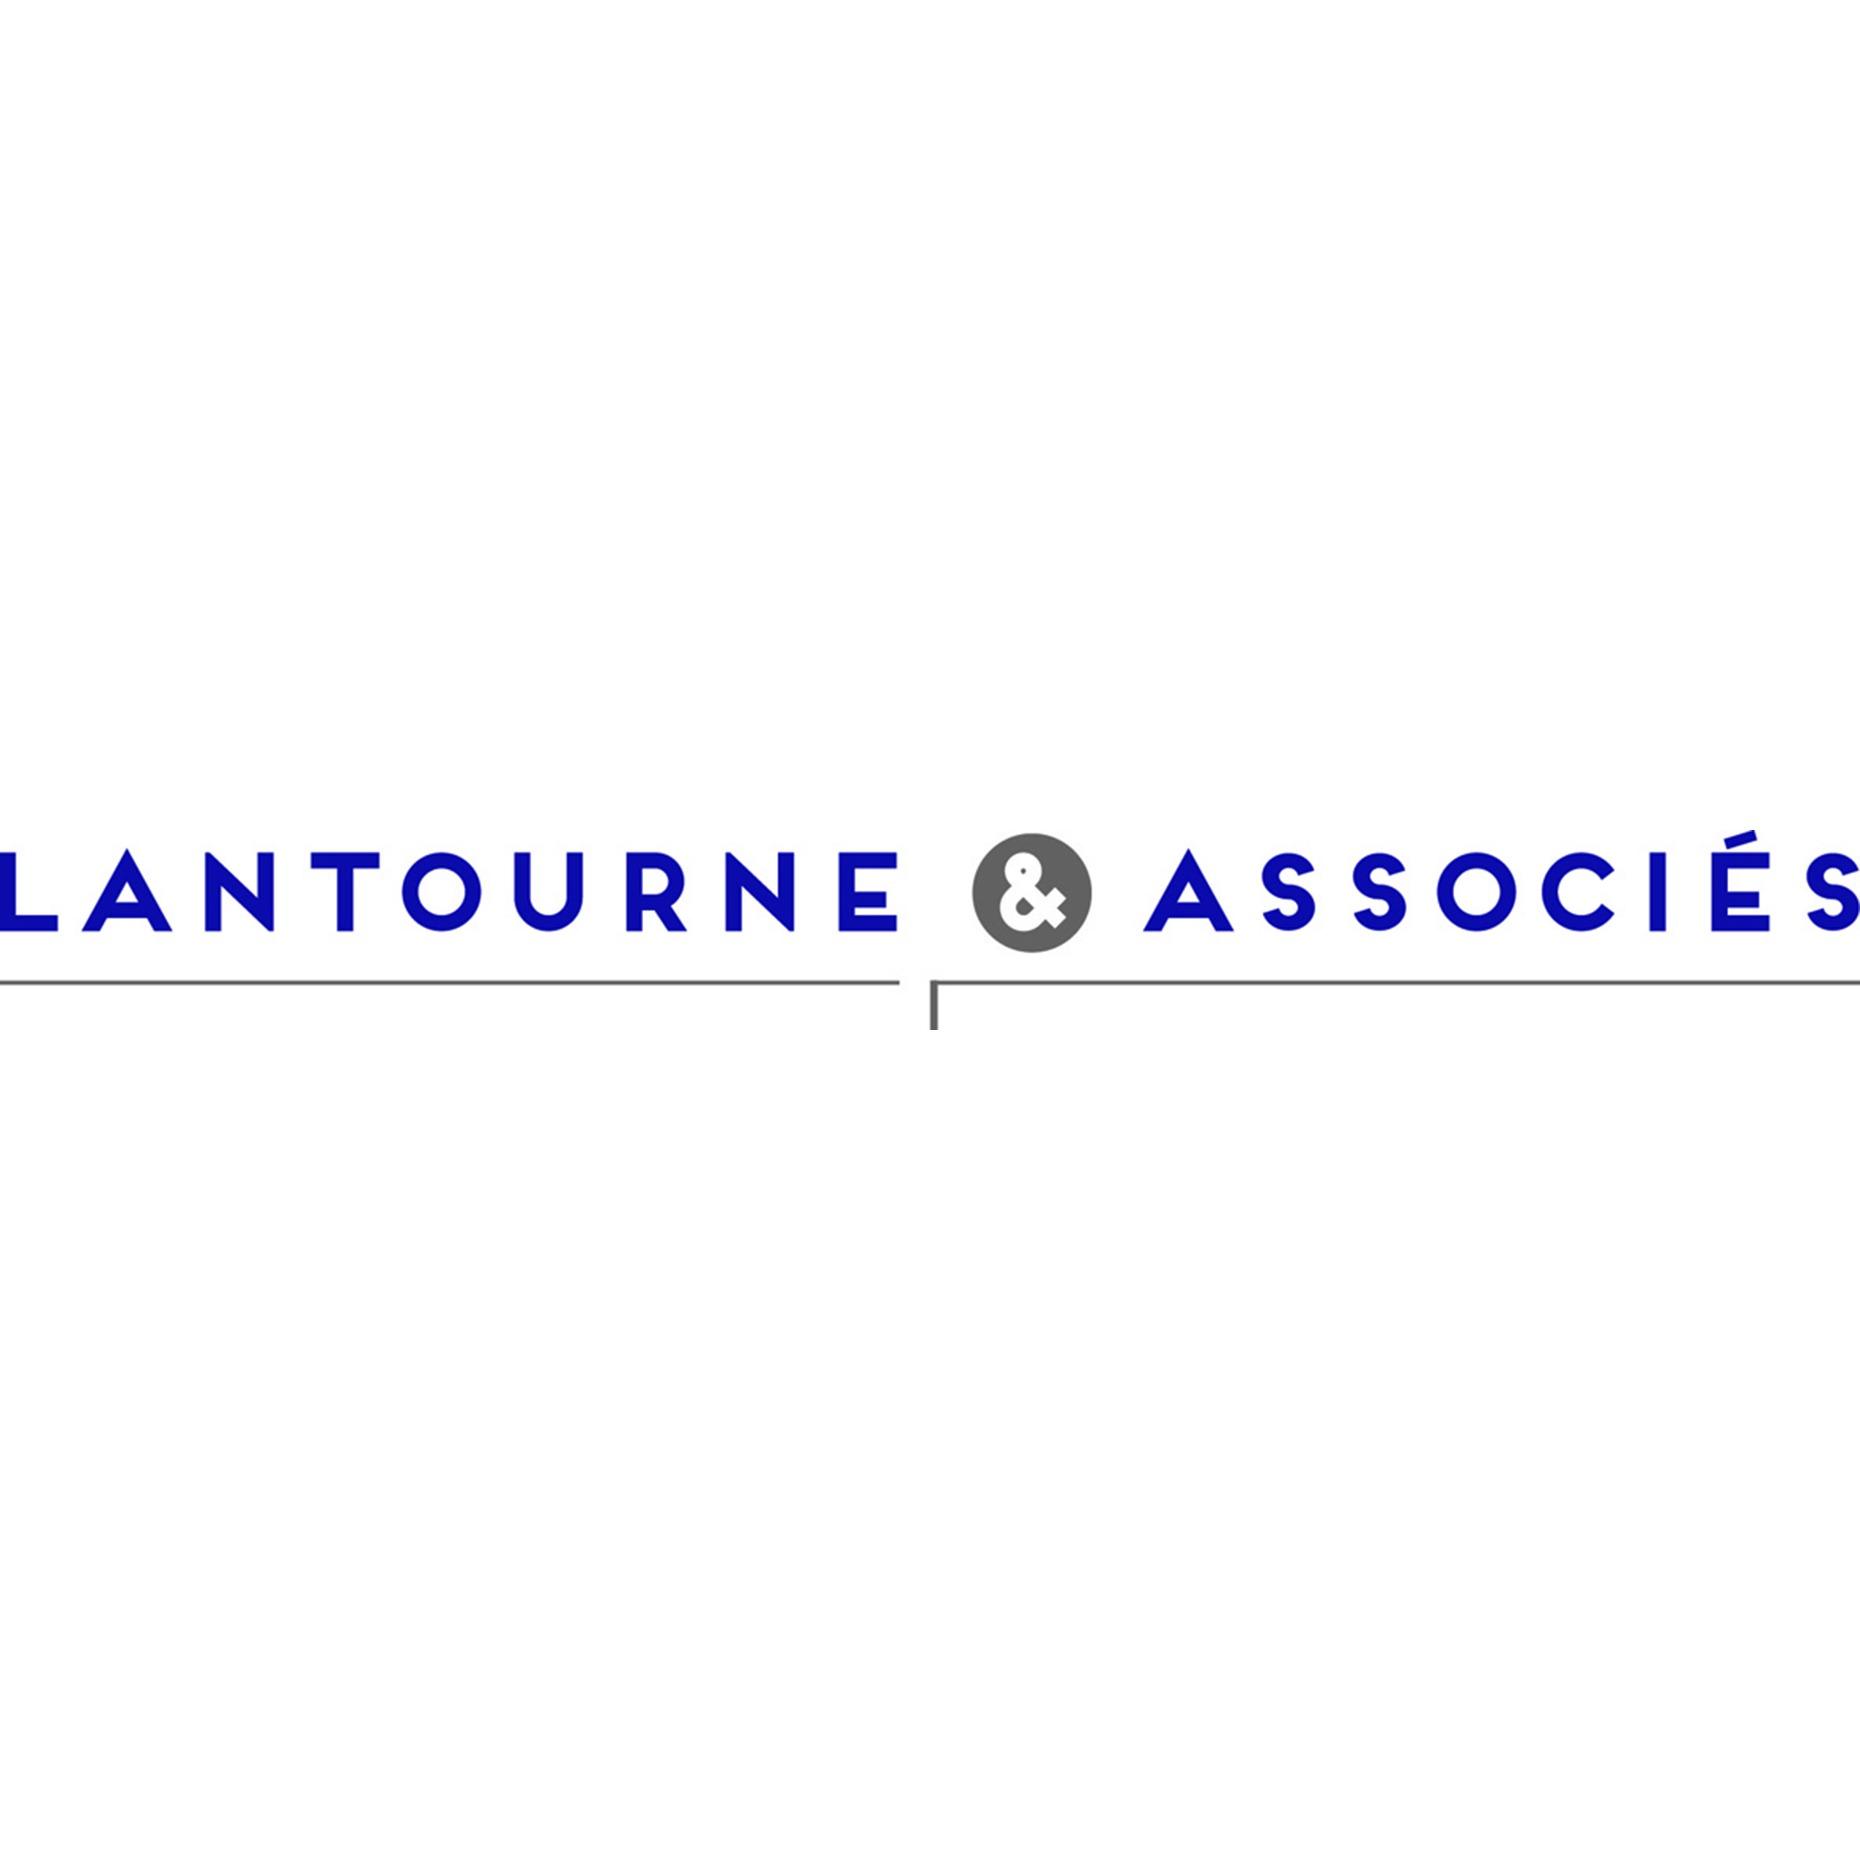 the Lantourne & Associés logo.